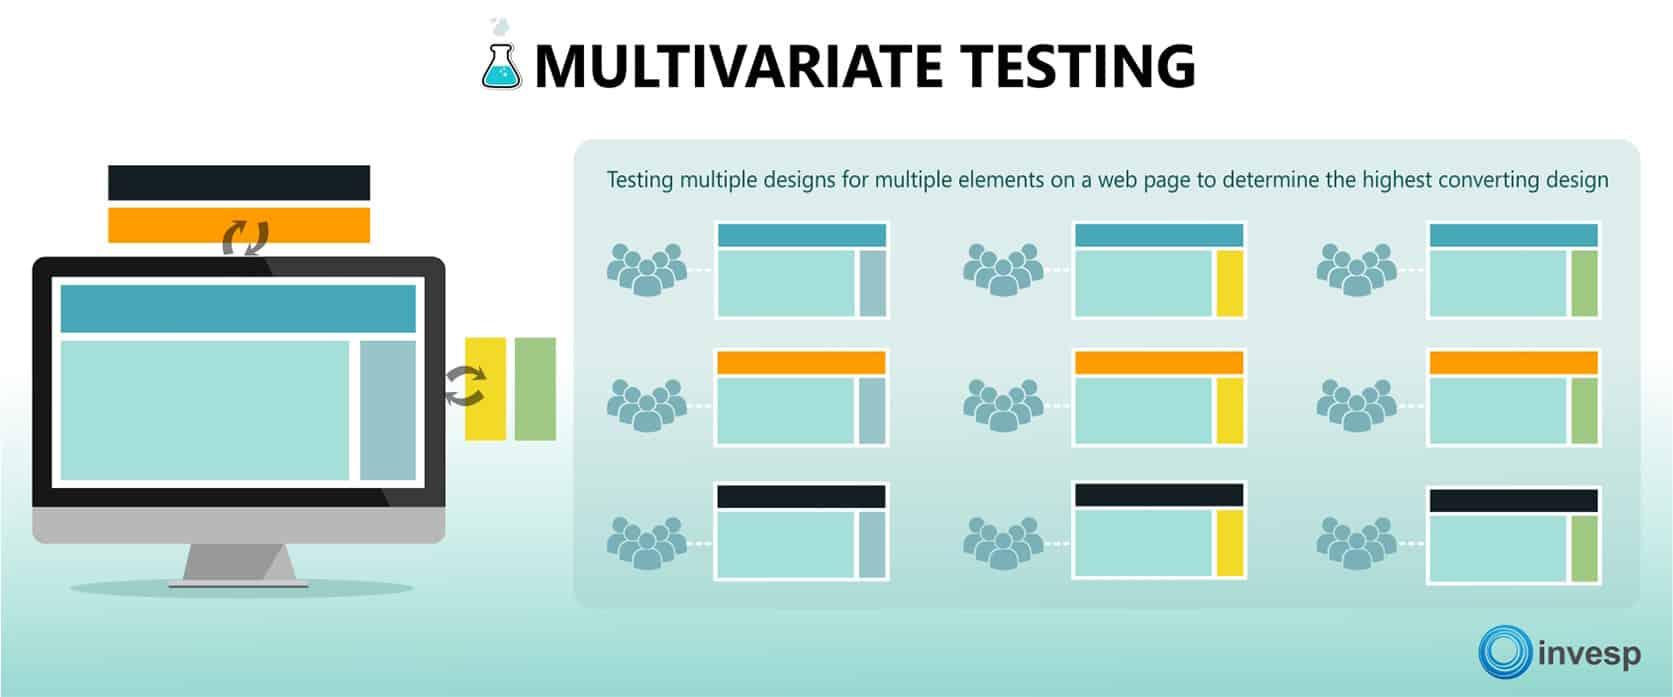 Multivariate testing broken down into 9 variations.